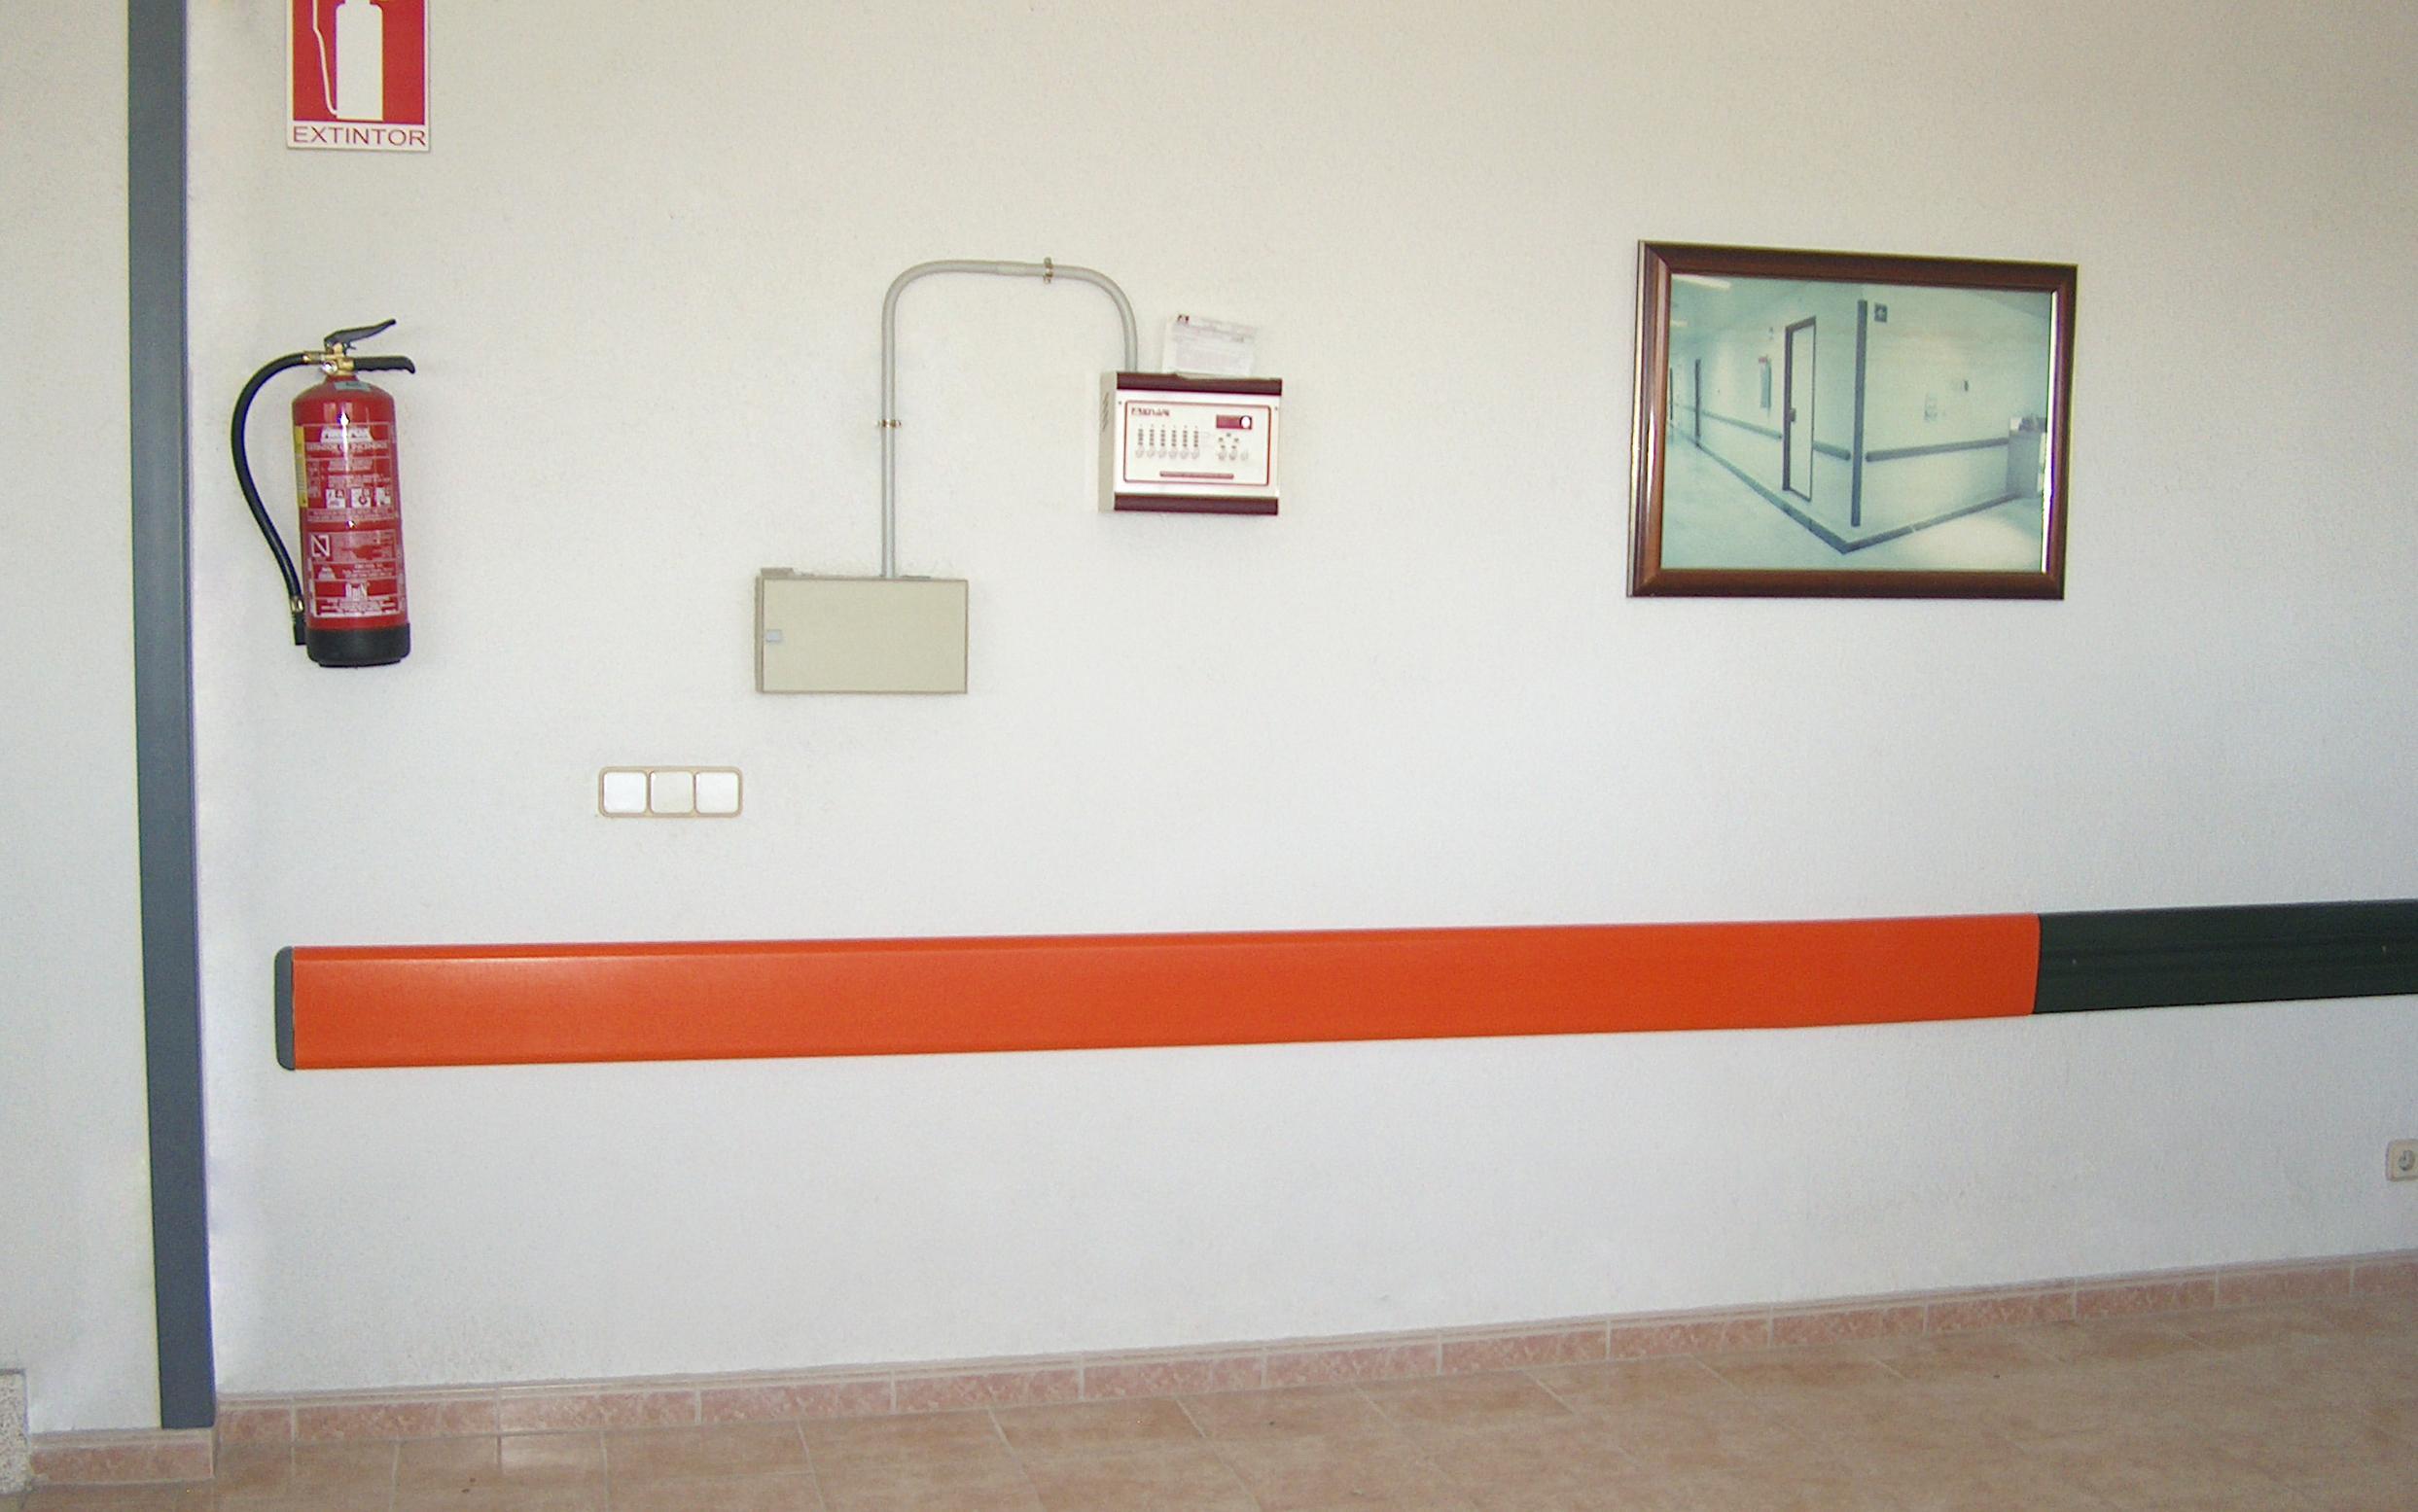 hospital-wall-protector-economic